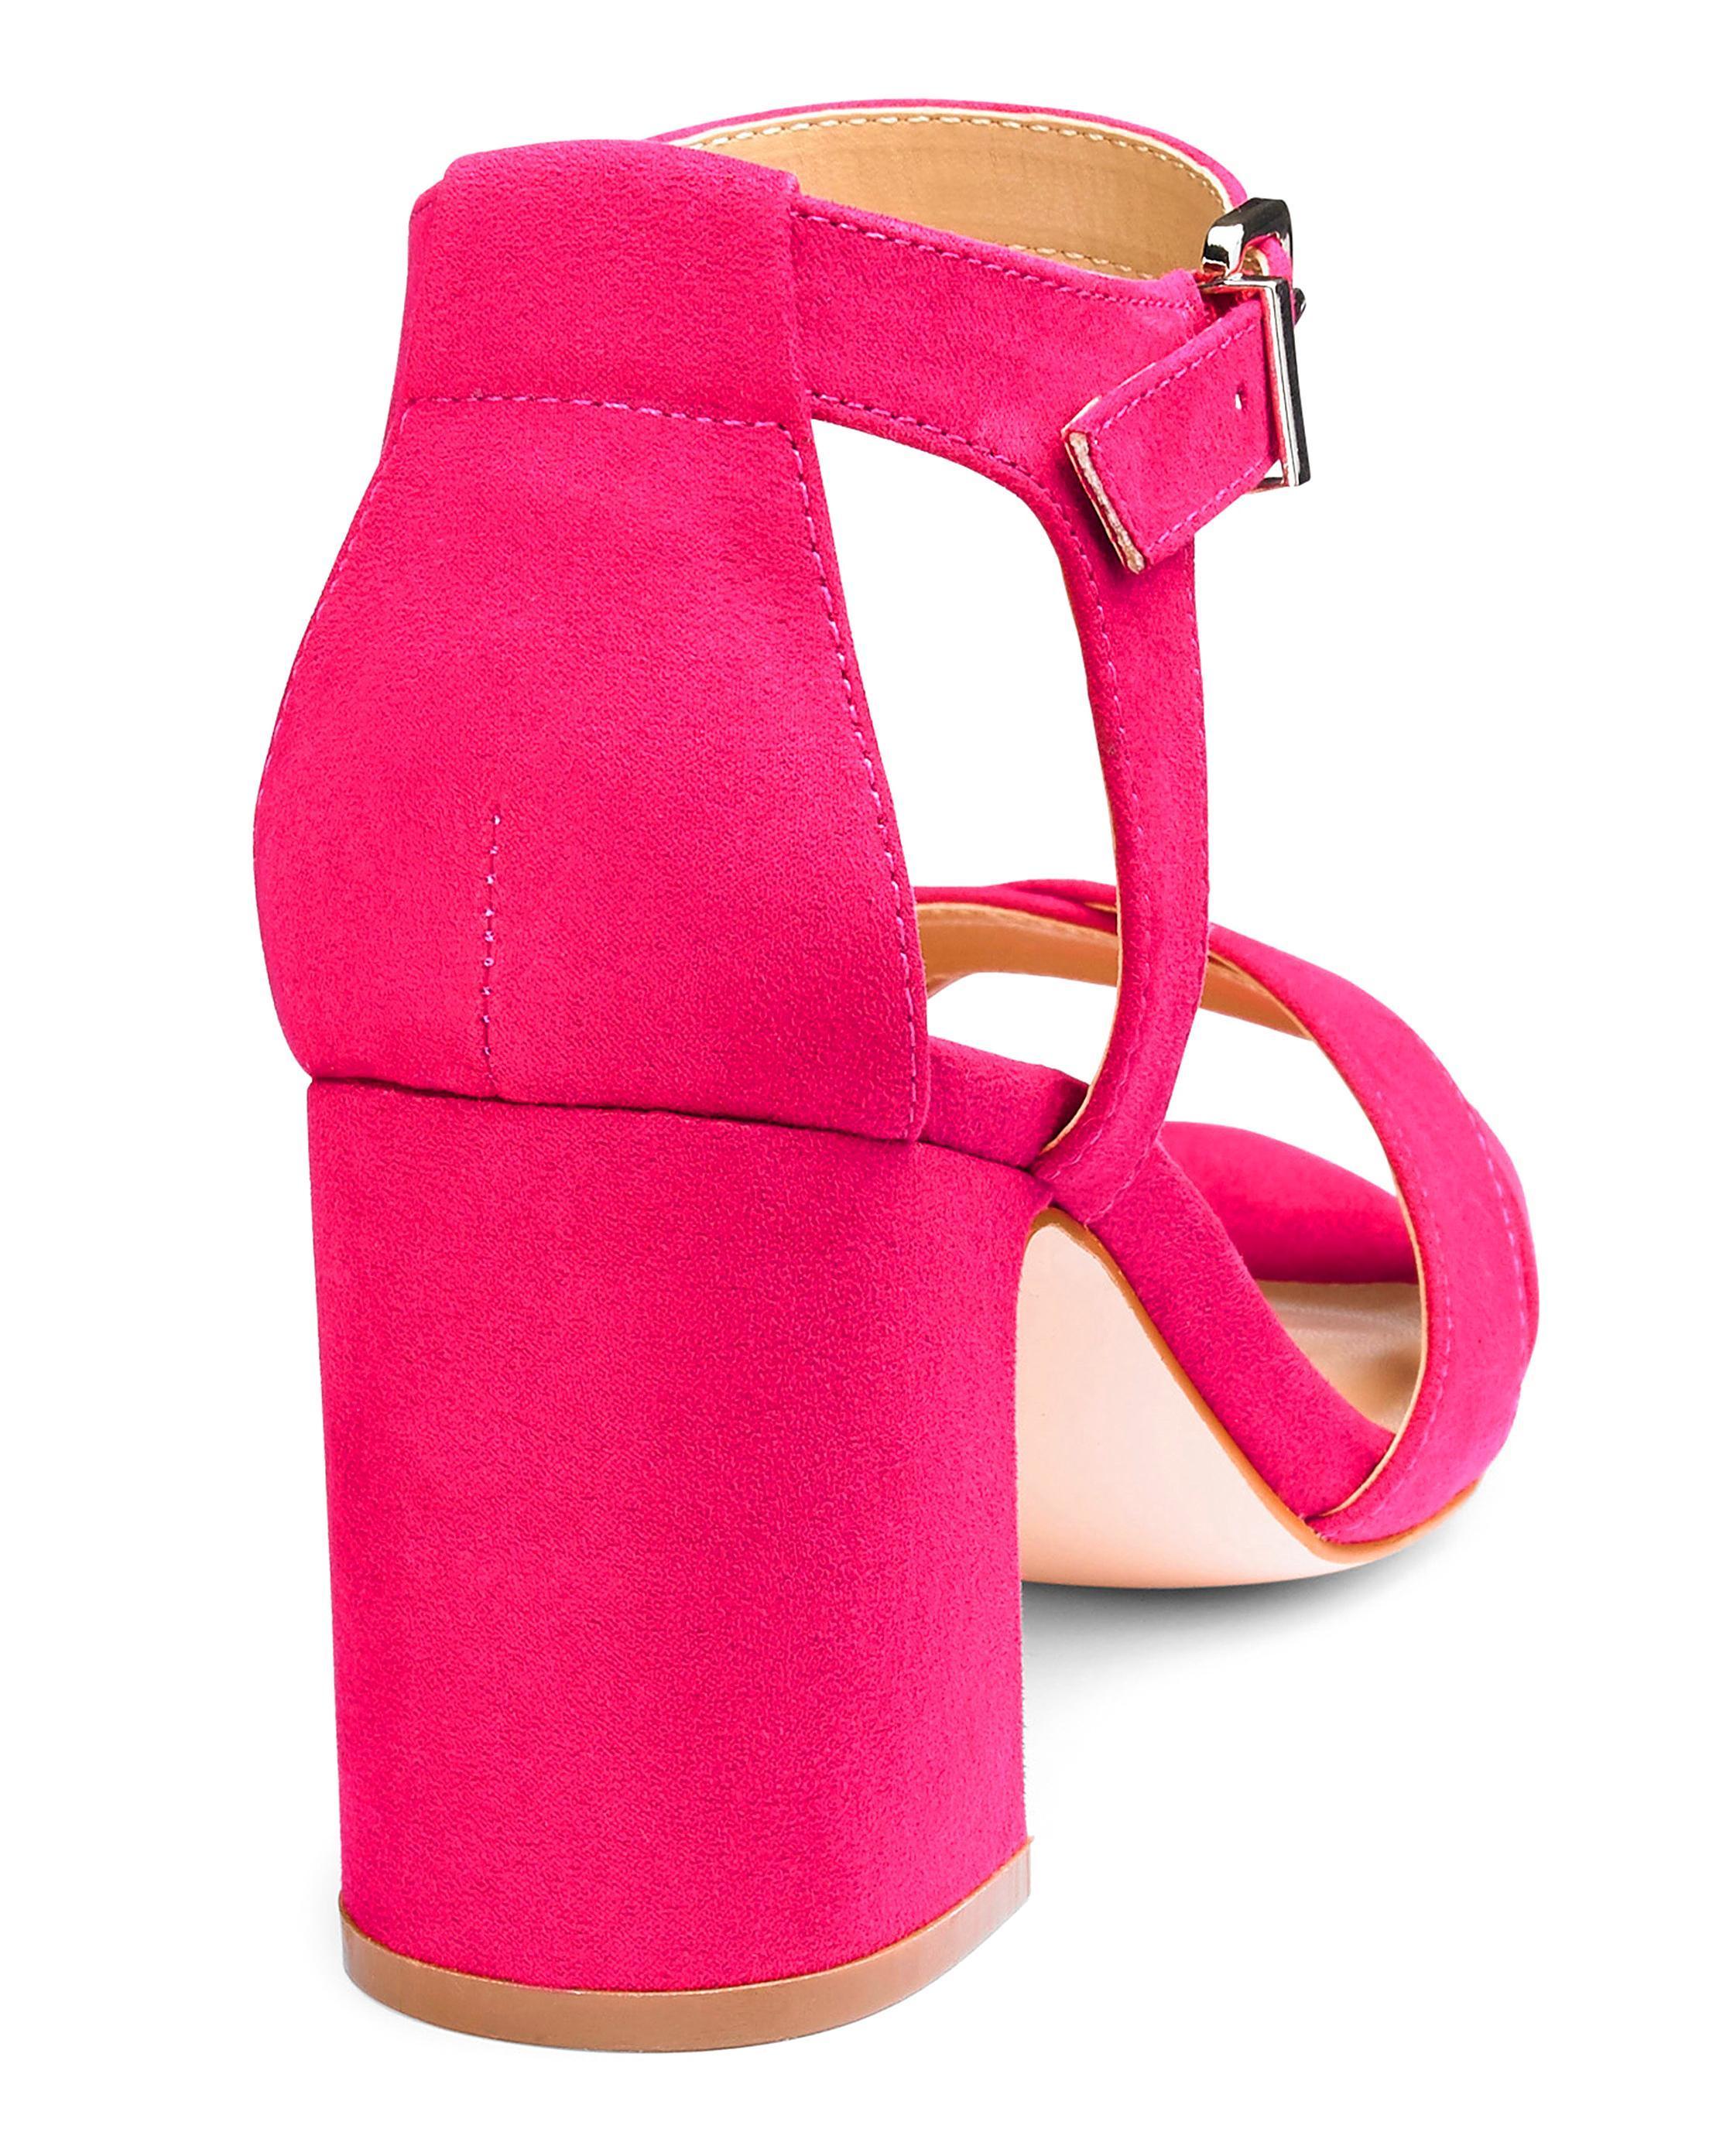 eeacd99b4e4 Lyst - Simply Be Helen Block Heels in Pink